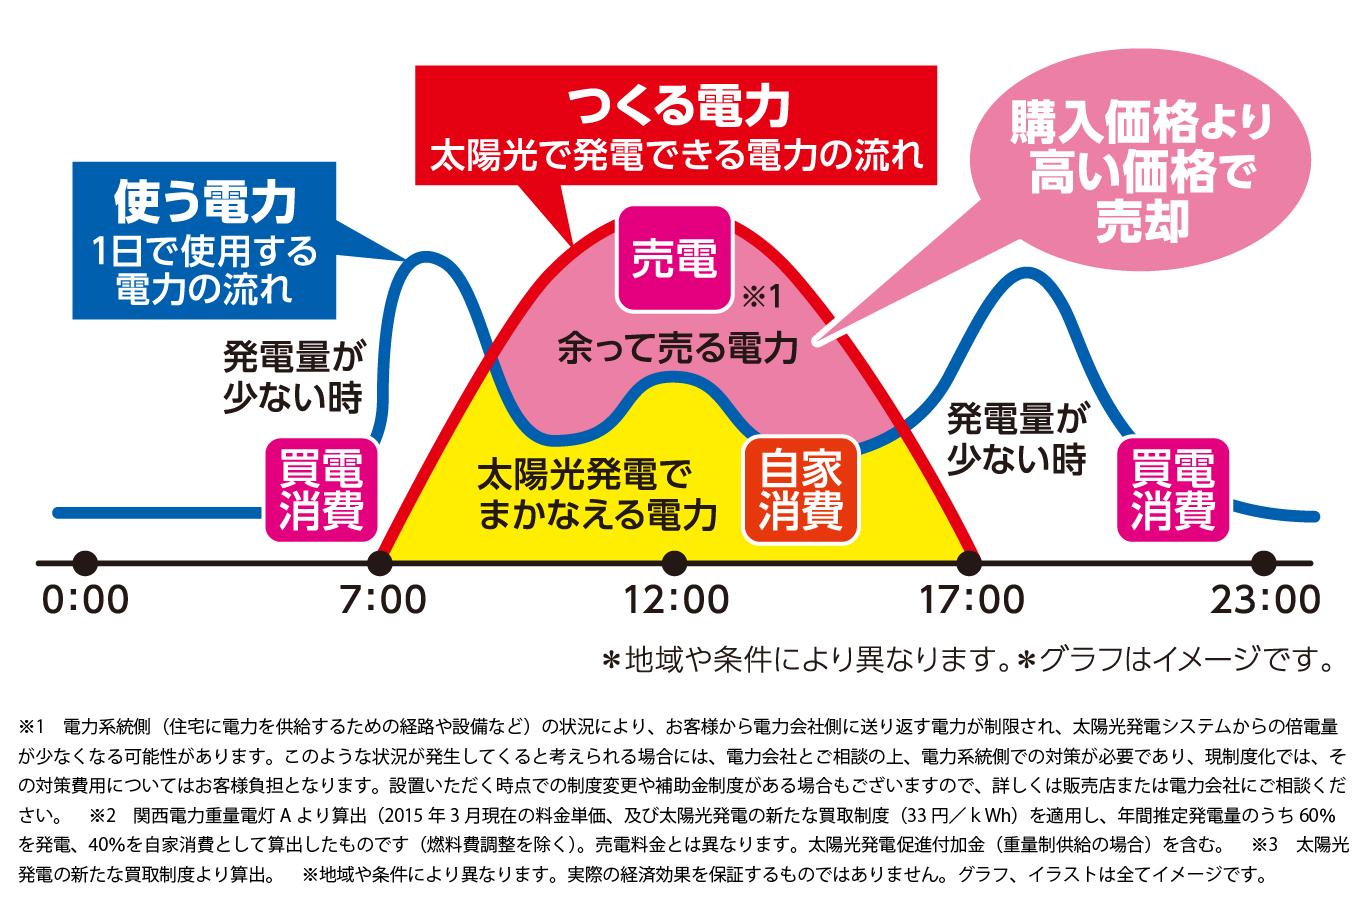 151028_taiyoukou_02-09